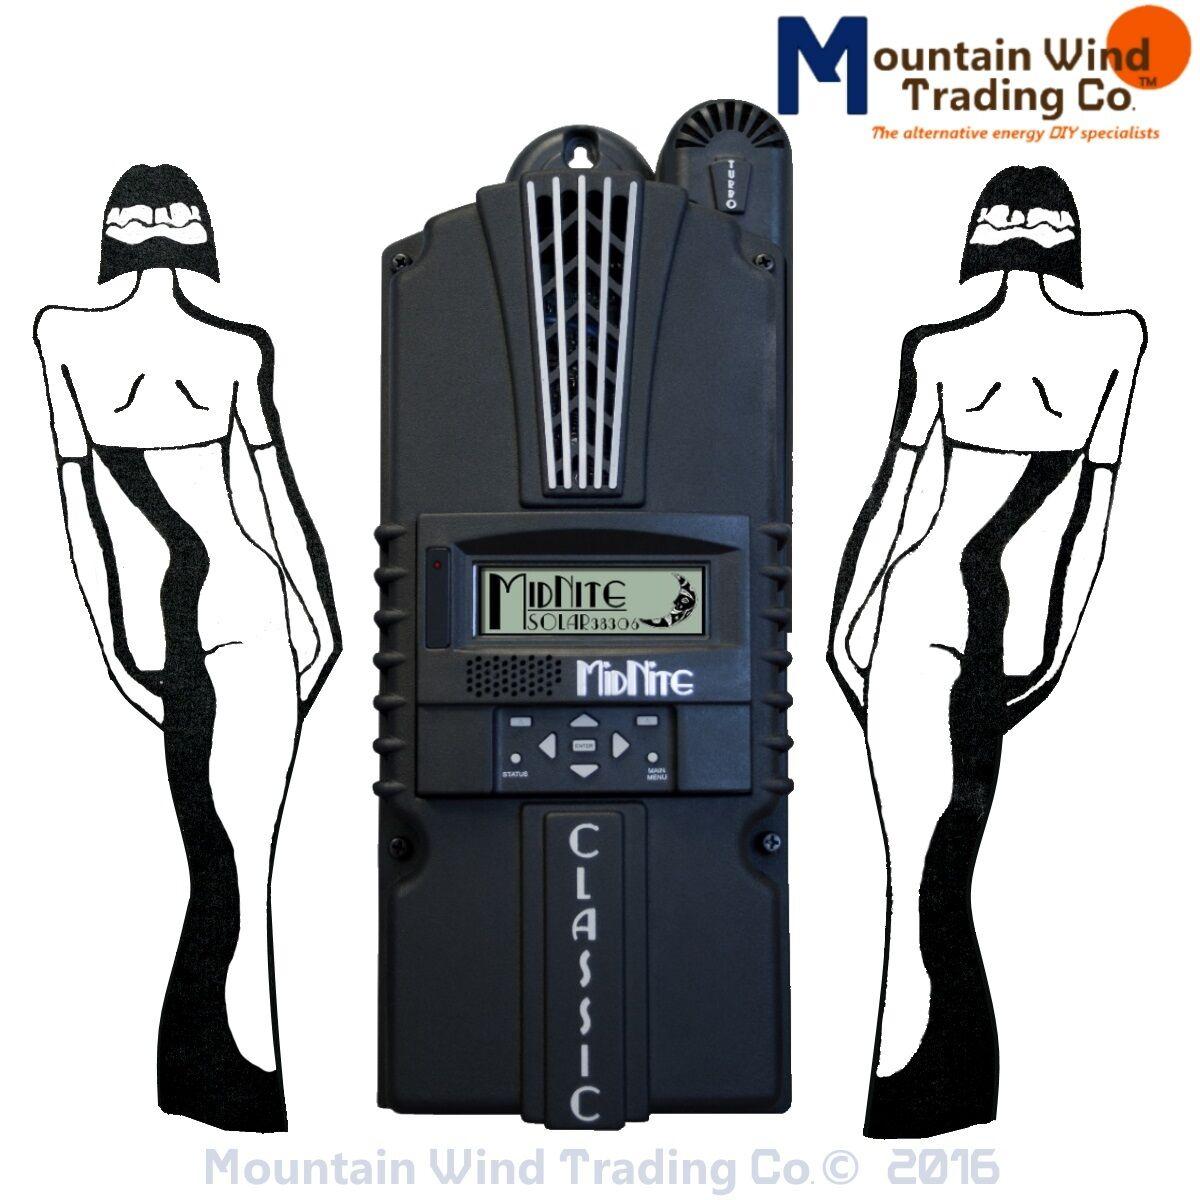 MidNite Classic 150 SL MPPT Solar Charge Controller Regulator 96A 150V